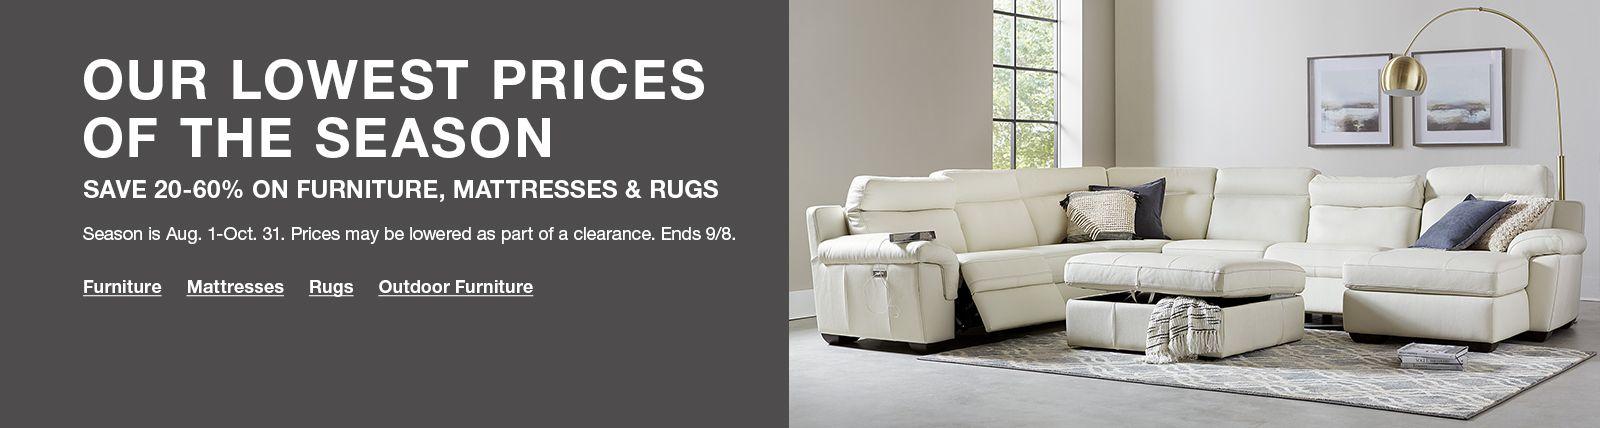 26cb2367 Macy's - Shop Fashion Clothing & Accessories - Official Site - Macys.com